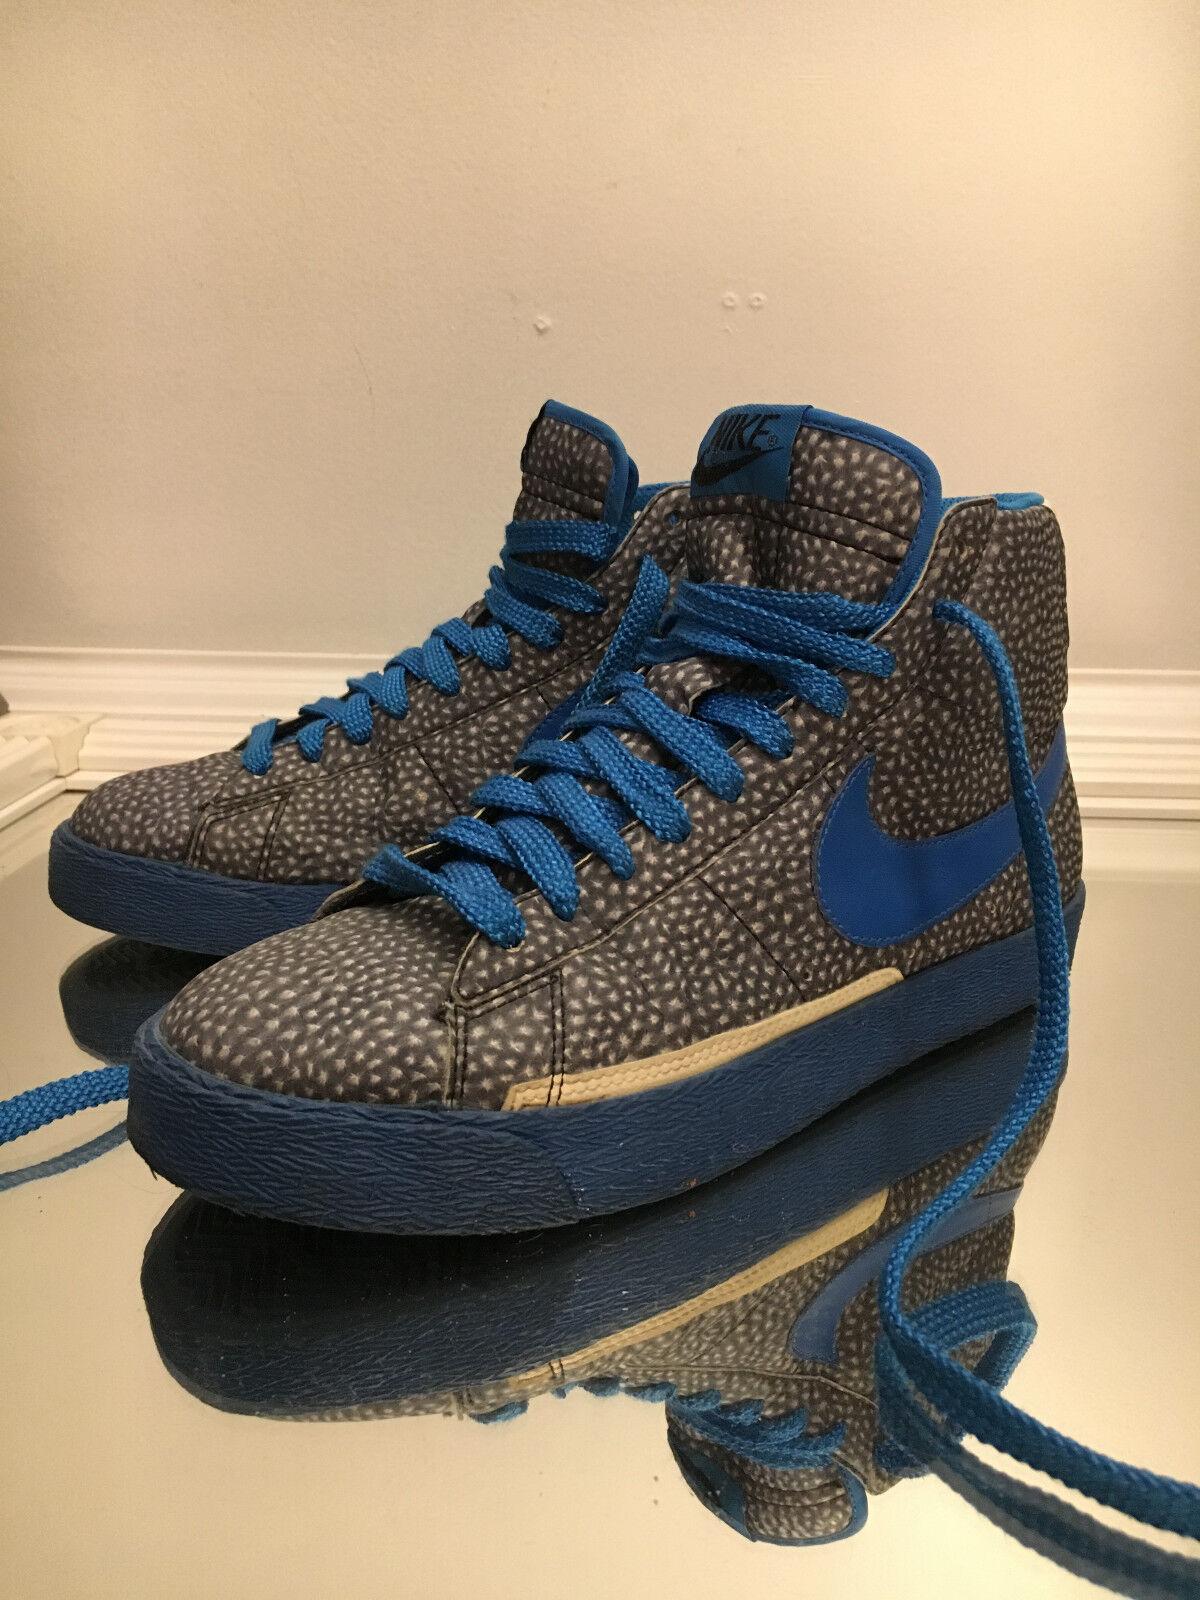 RARE  Nike Blazer High Premium Photo bluee Glow In The Dark Size 8.5 312457-041